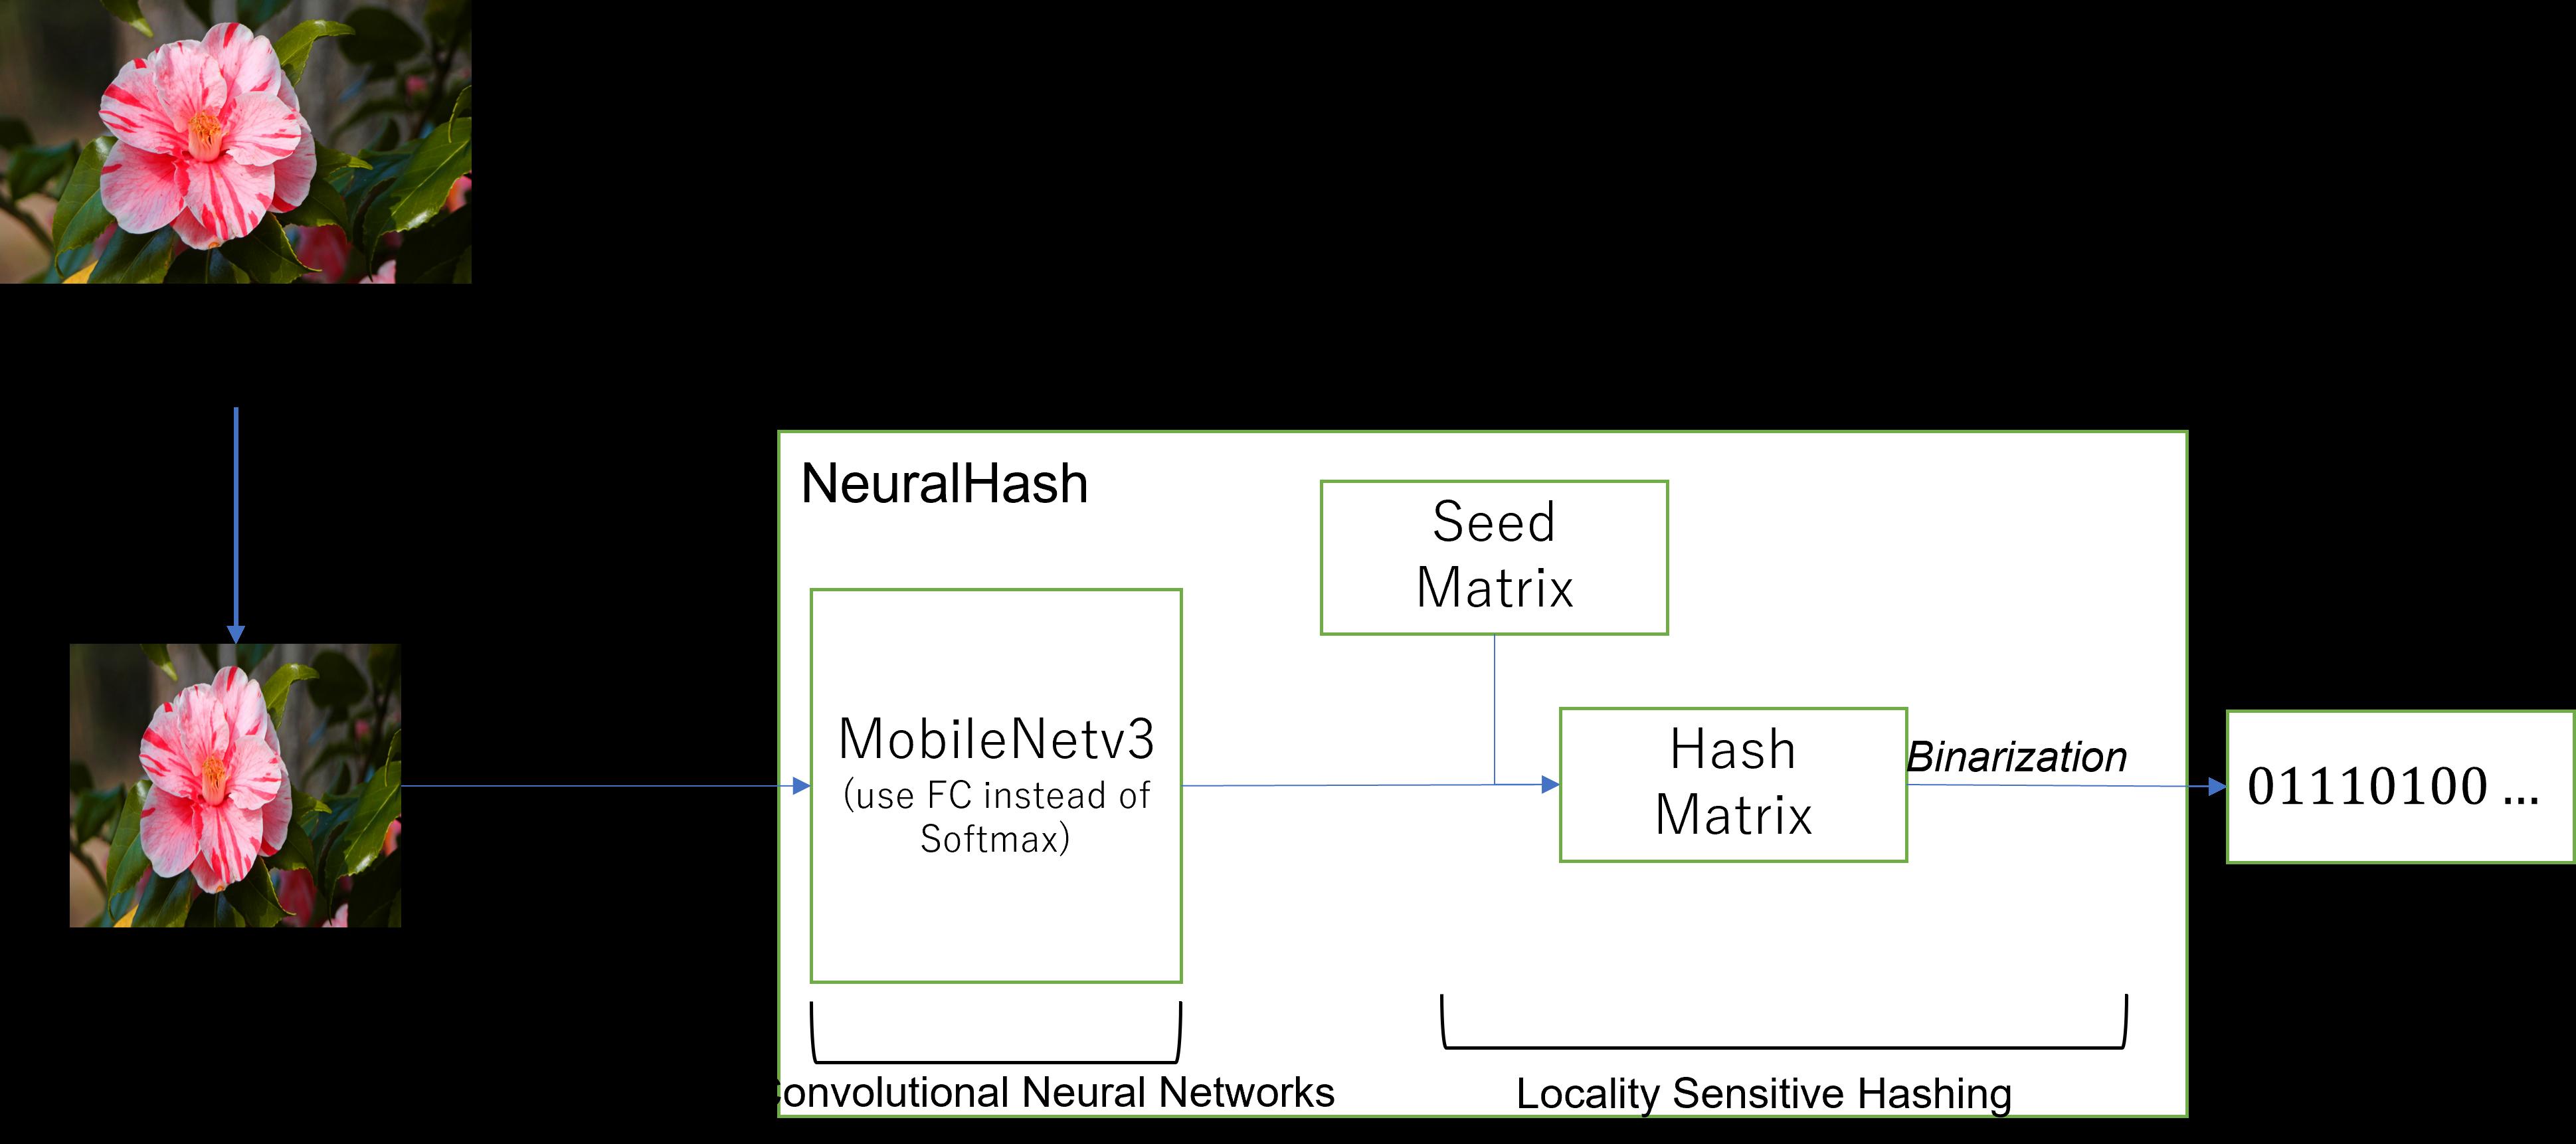 NeuralHash